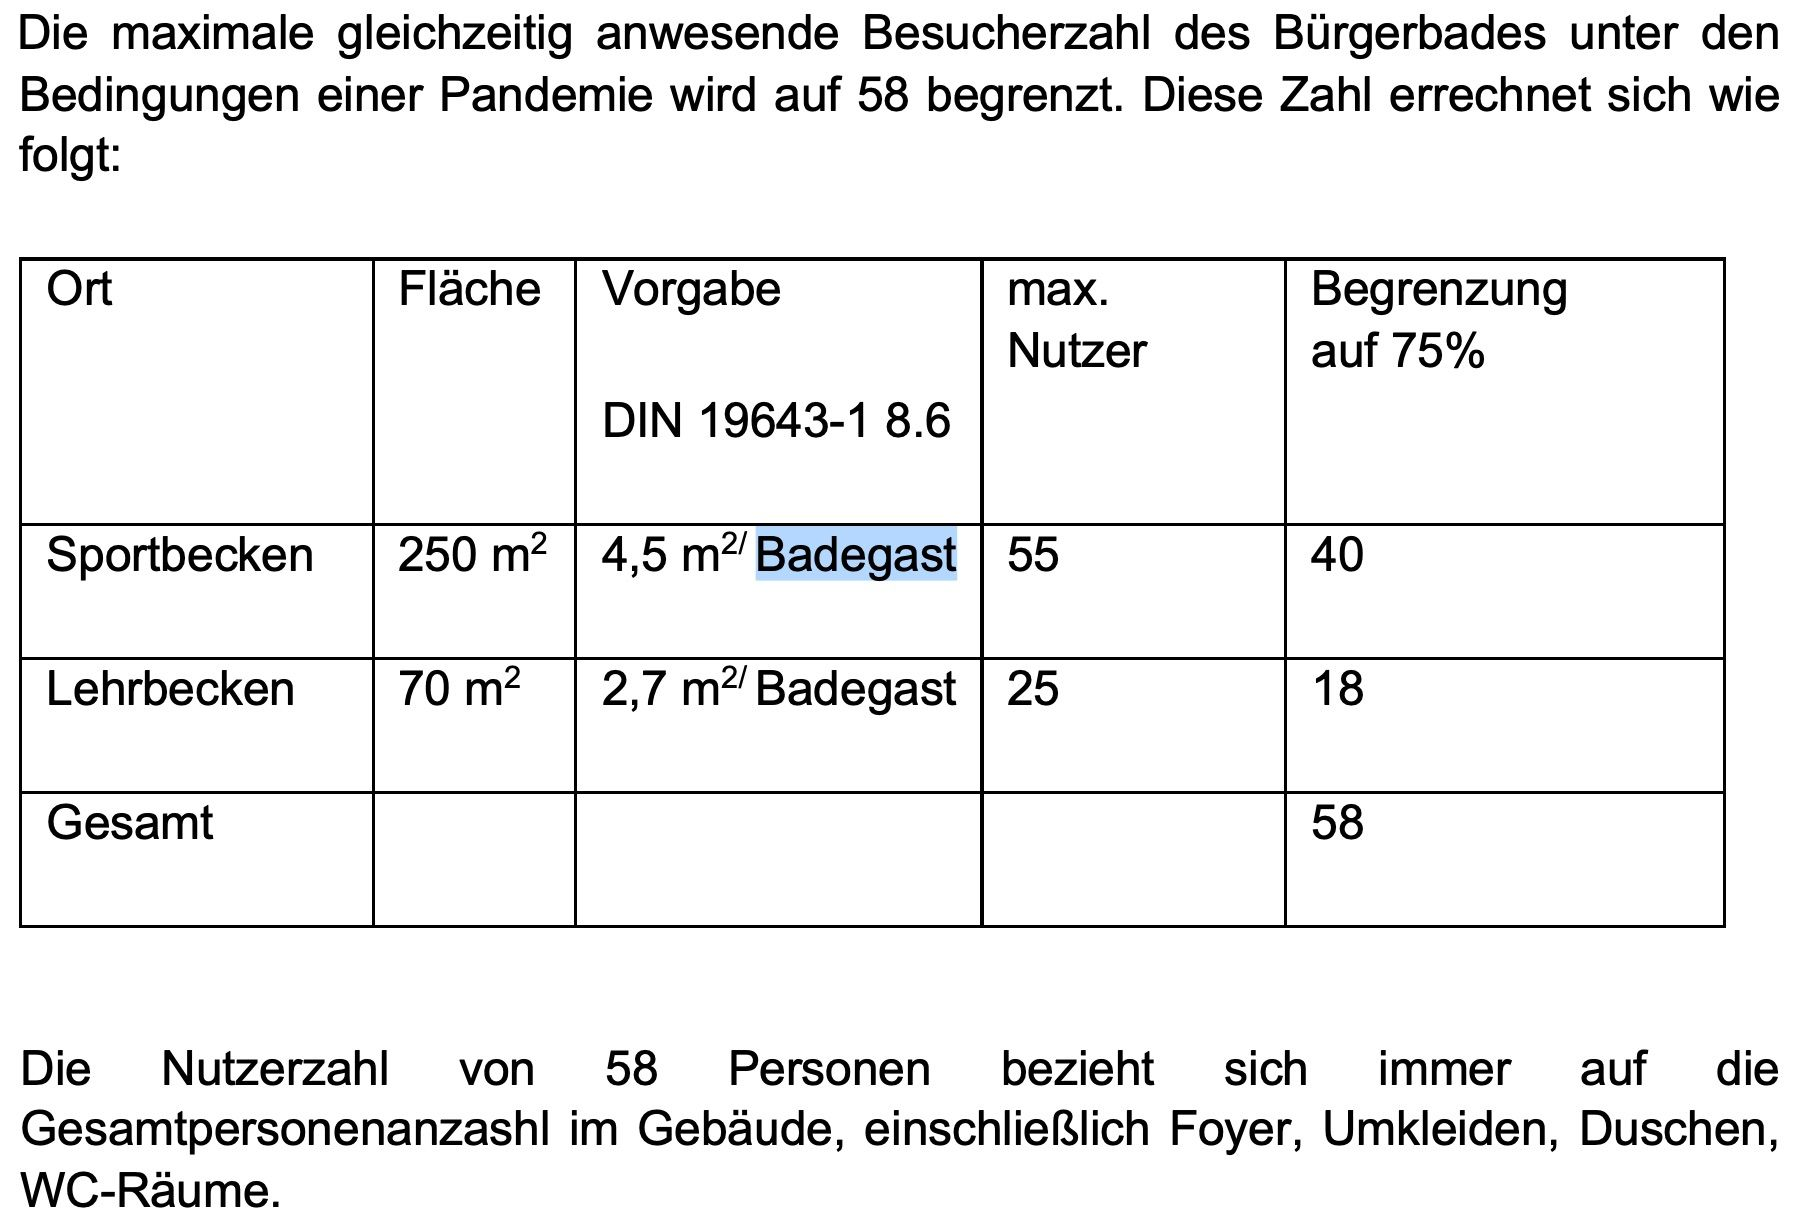 CORONA - Pandemieplan | Bürgerbad Handorf - BüBa